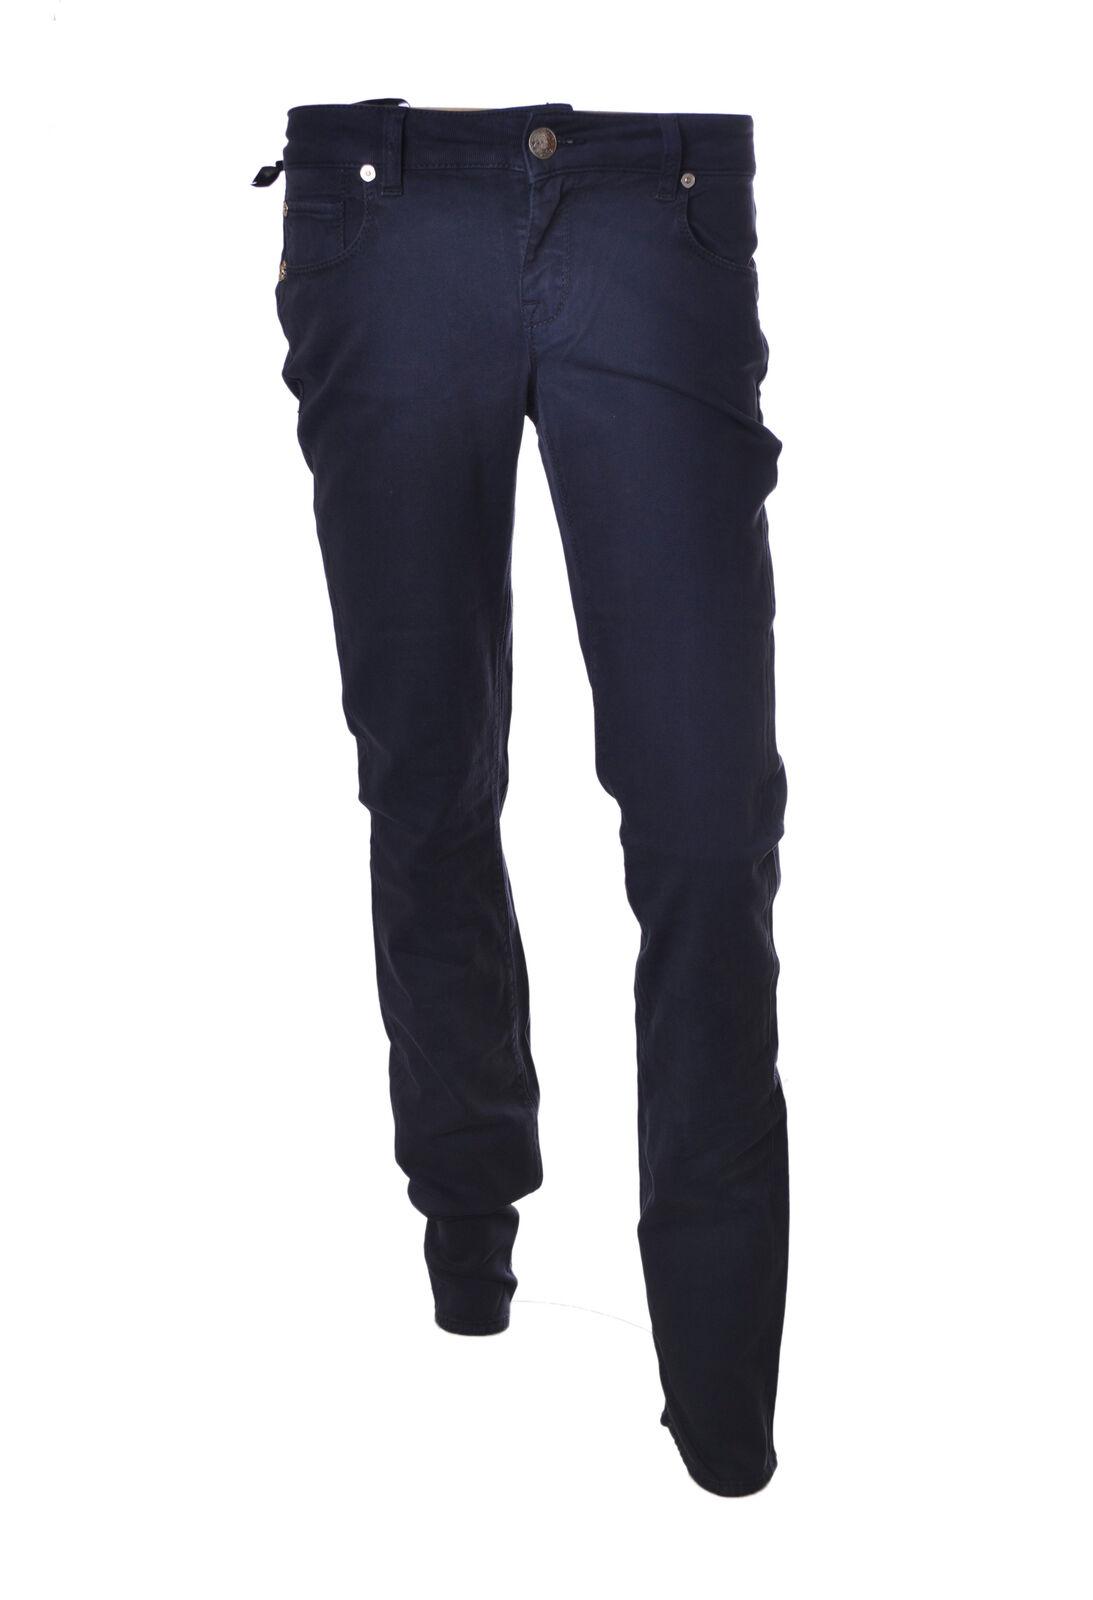 Latinò  -  Pants - Female - bluee - 4554731A185409